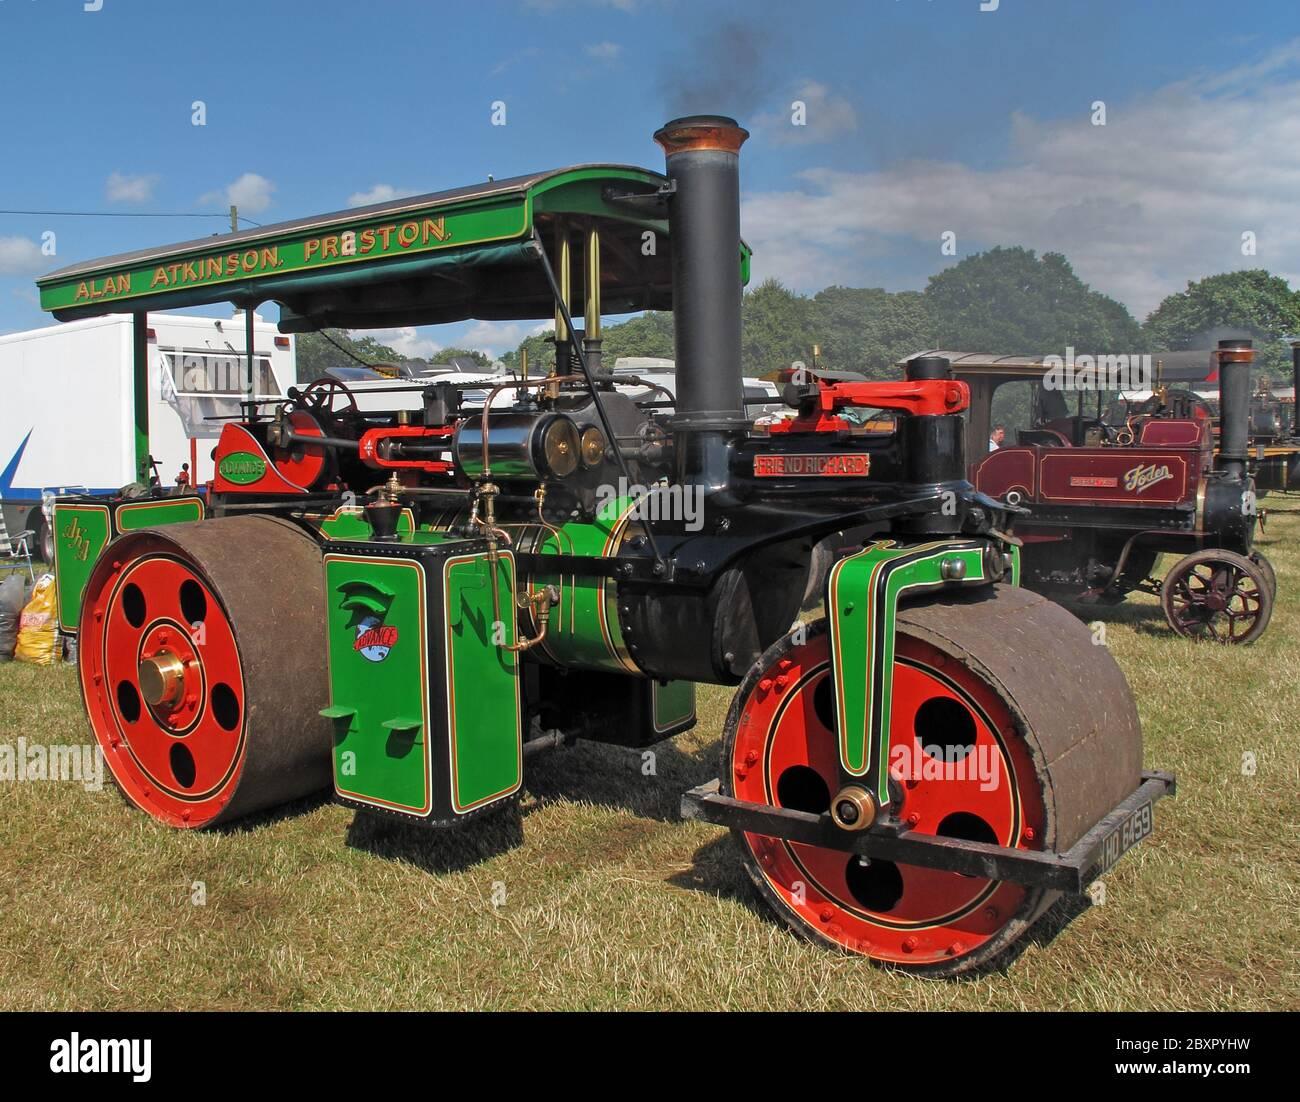 @HotpixUK,HotpixUK,GoTonySmith,logo,Victorian,brass,vehicle,engine,steam,field,fayre,two,several,traction,traction engine,summer,Friend Richard,Alan Atkinson,Preston,steam roller engine,Friend,steam power,steam powered,roller,Cheshire,England,UK